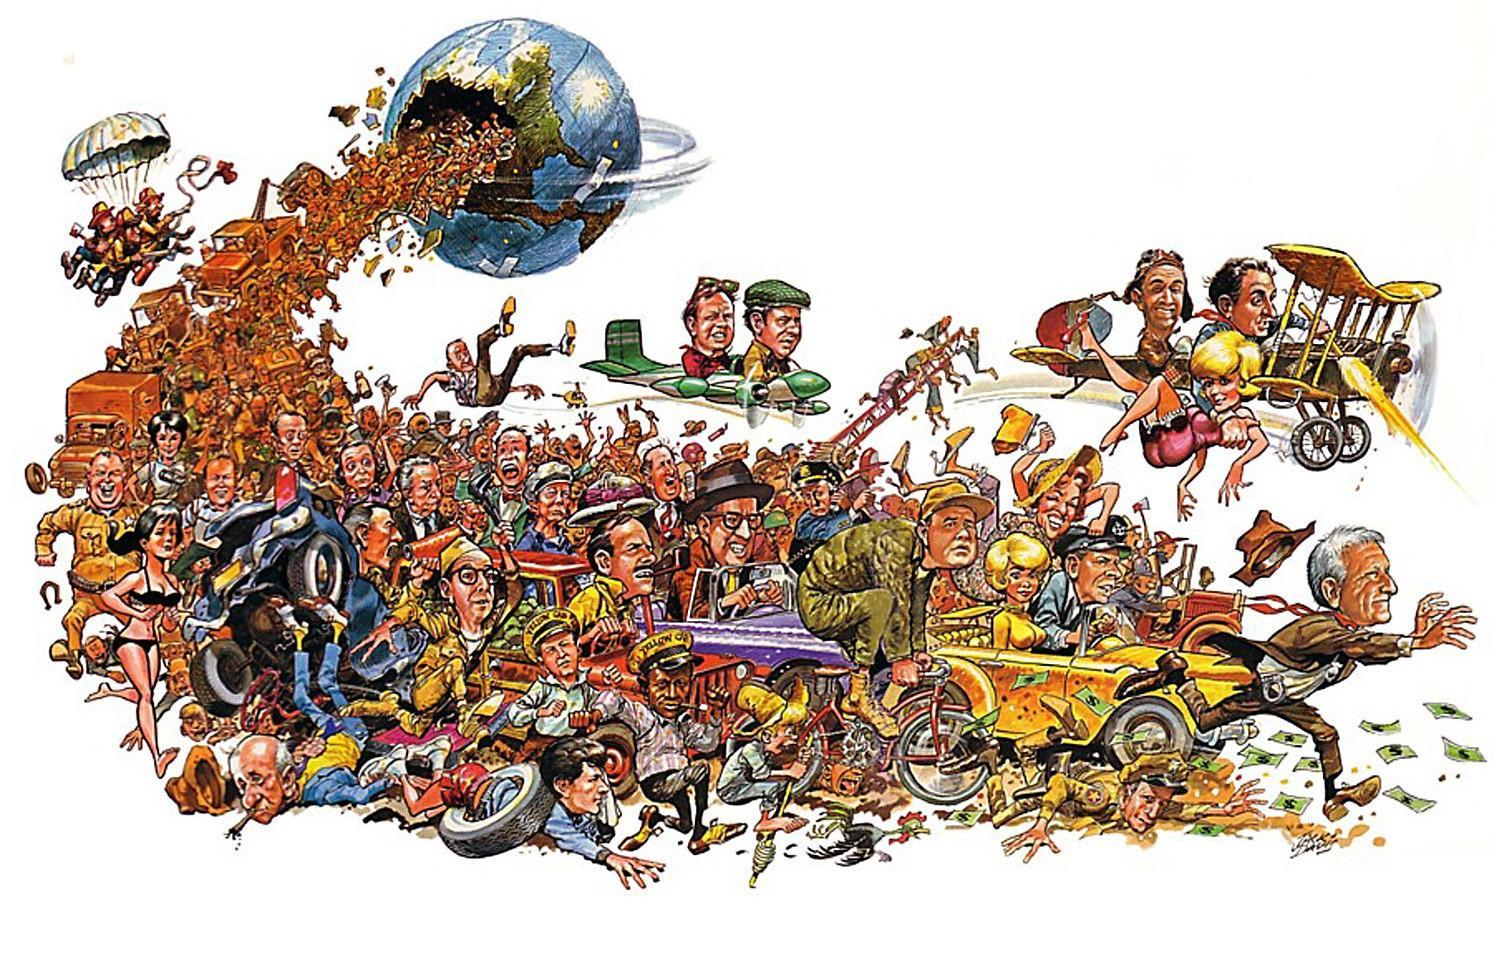 Jack%2BDavis-Mad%2BWorld-poster.jpg